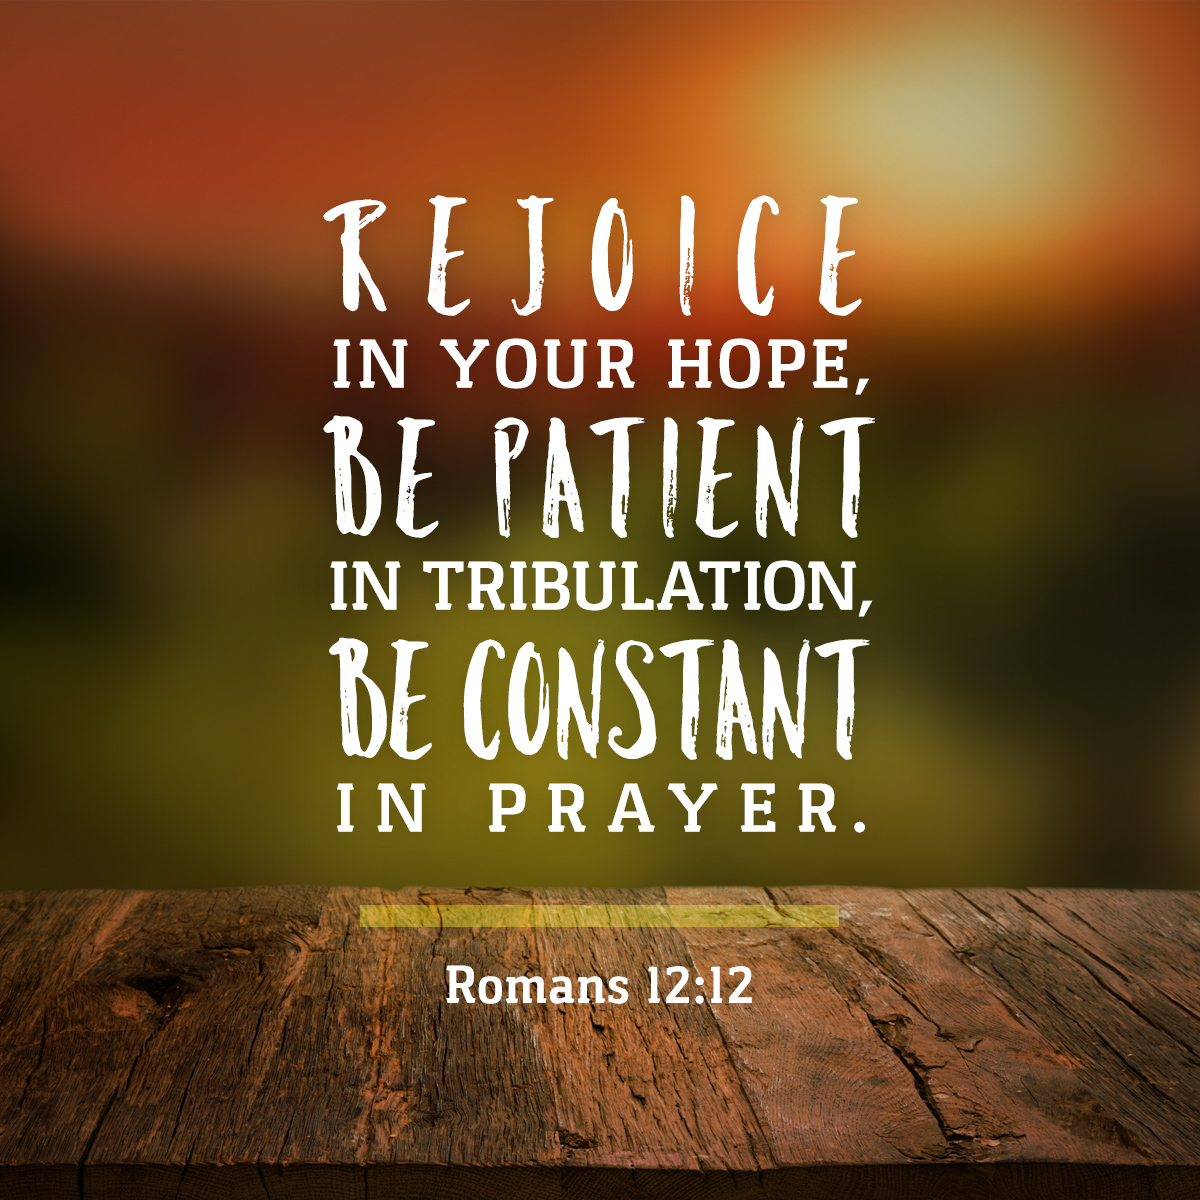 Romans 12:12 Daily Verse